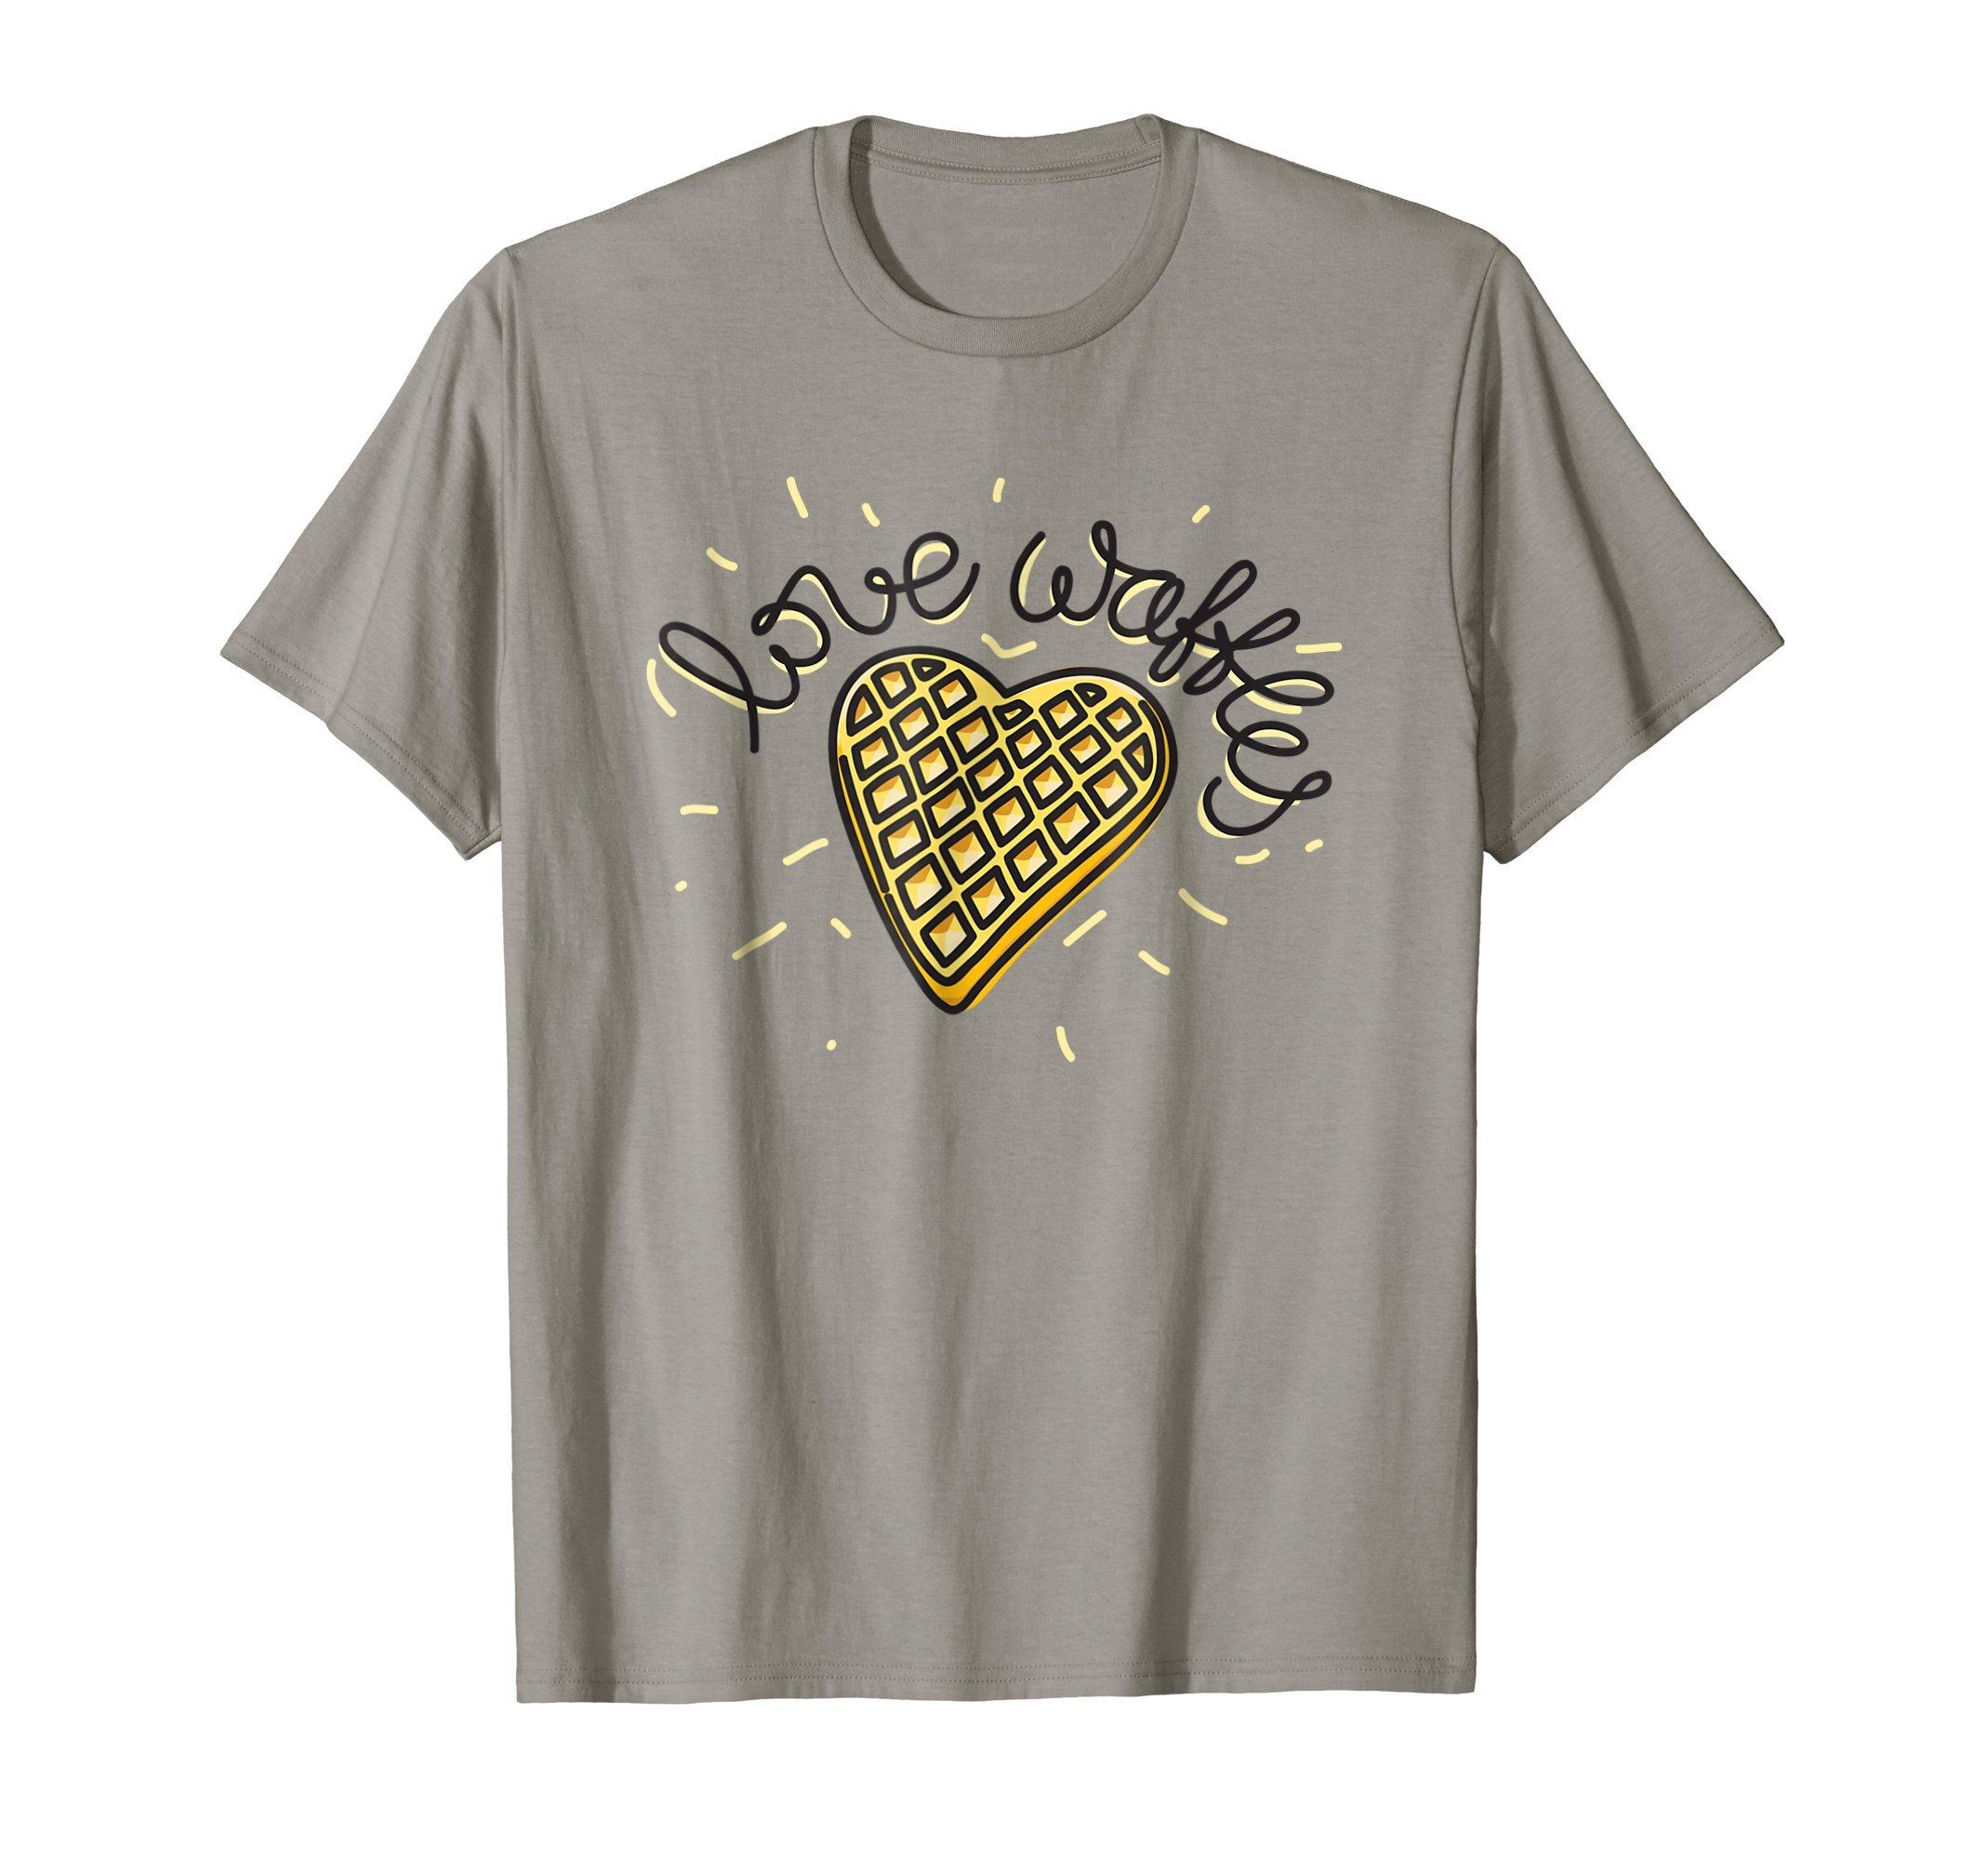 Love-Waffles-T-Shirt-Novelty-Fun-Shirt-Tee-Gift